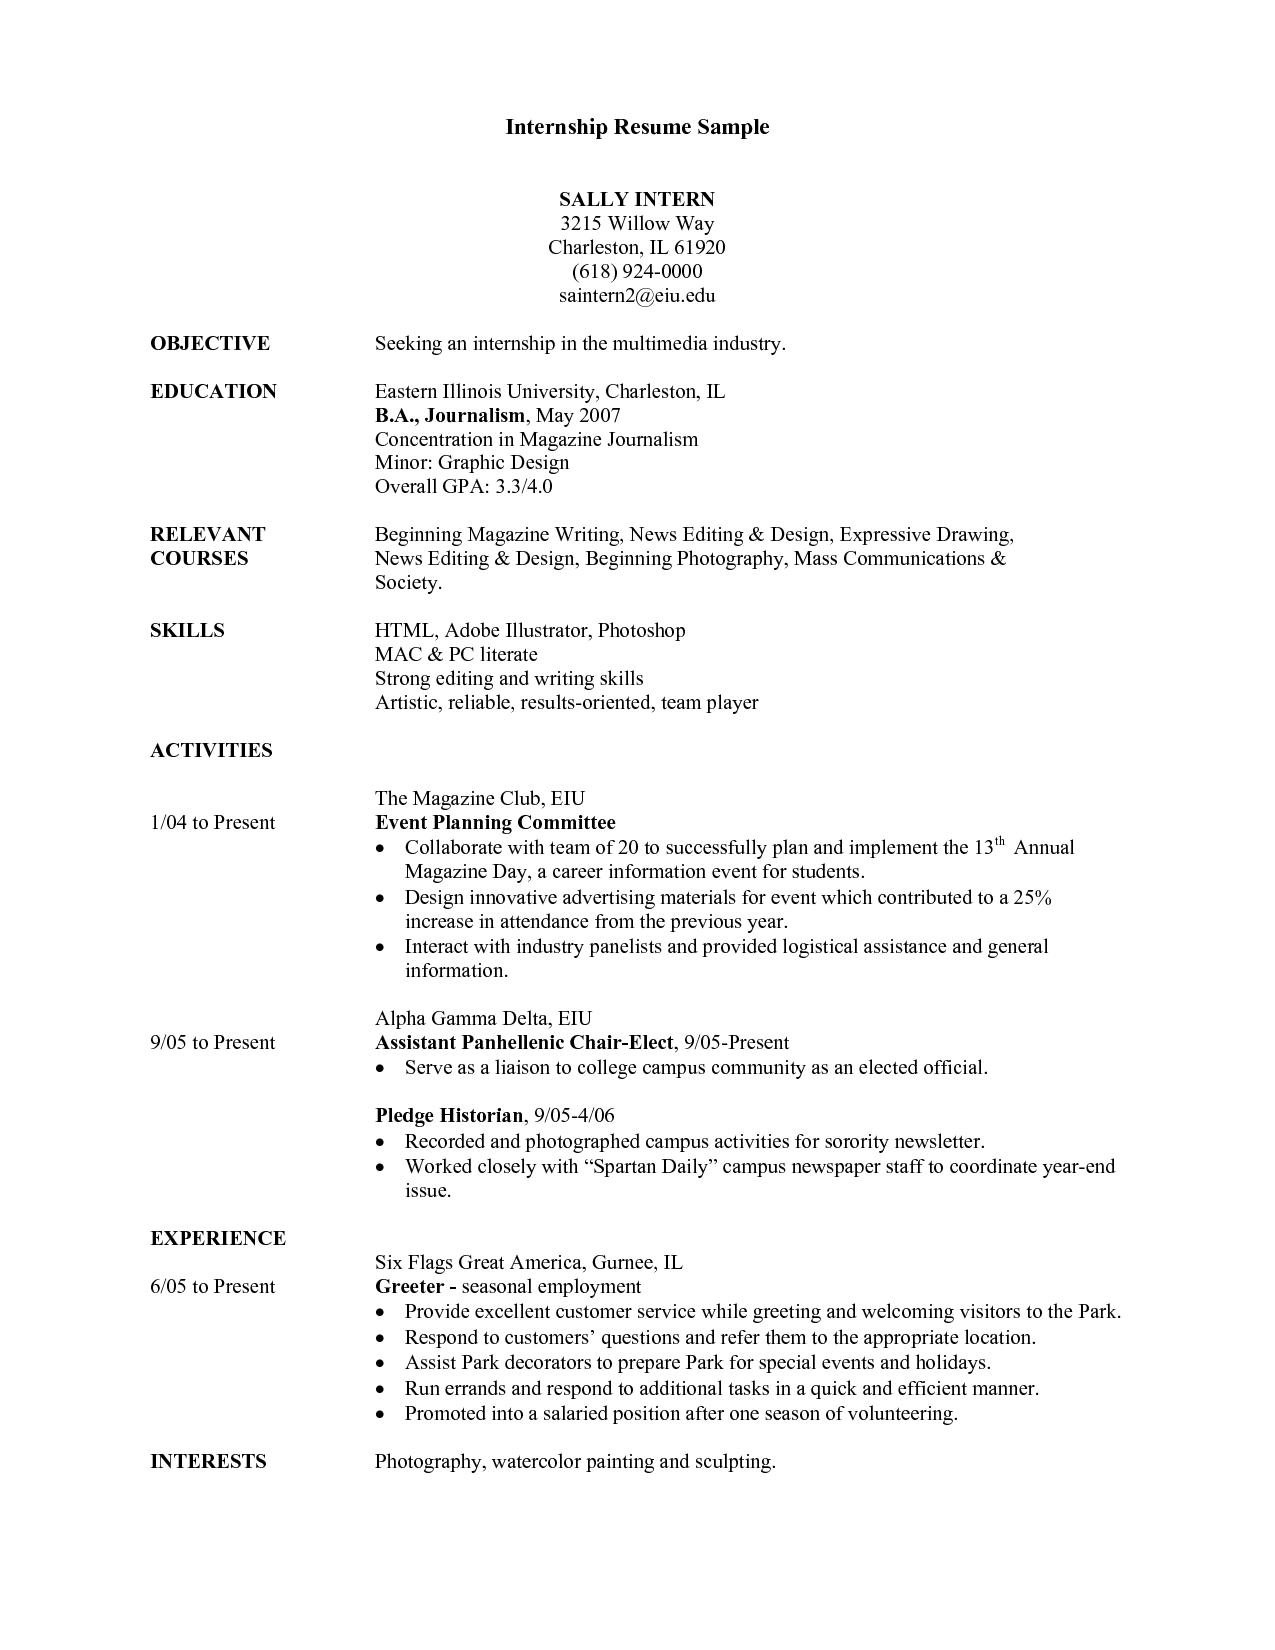 Curriculum Vitae For Internship Sample